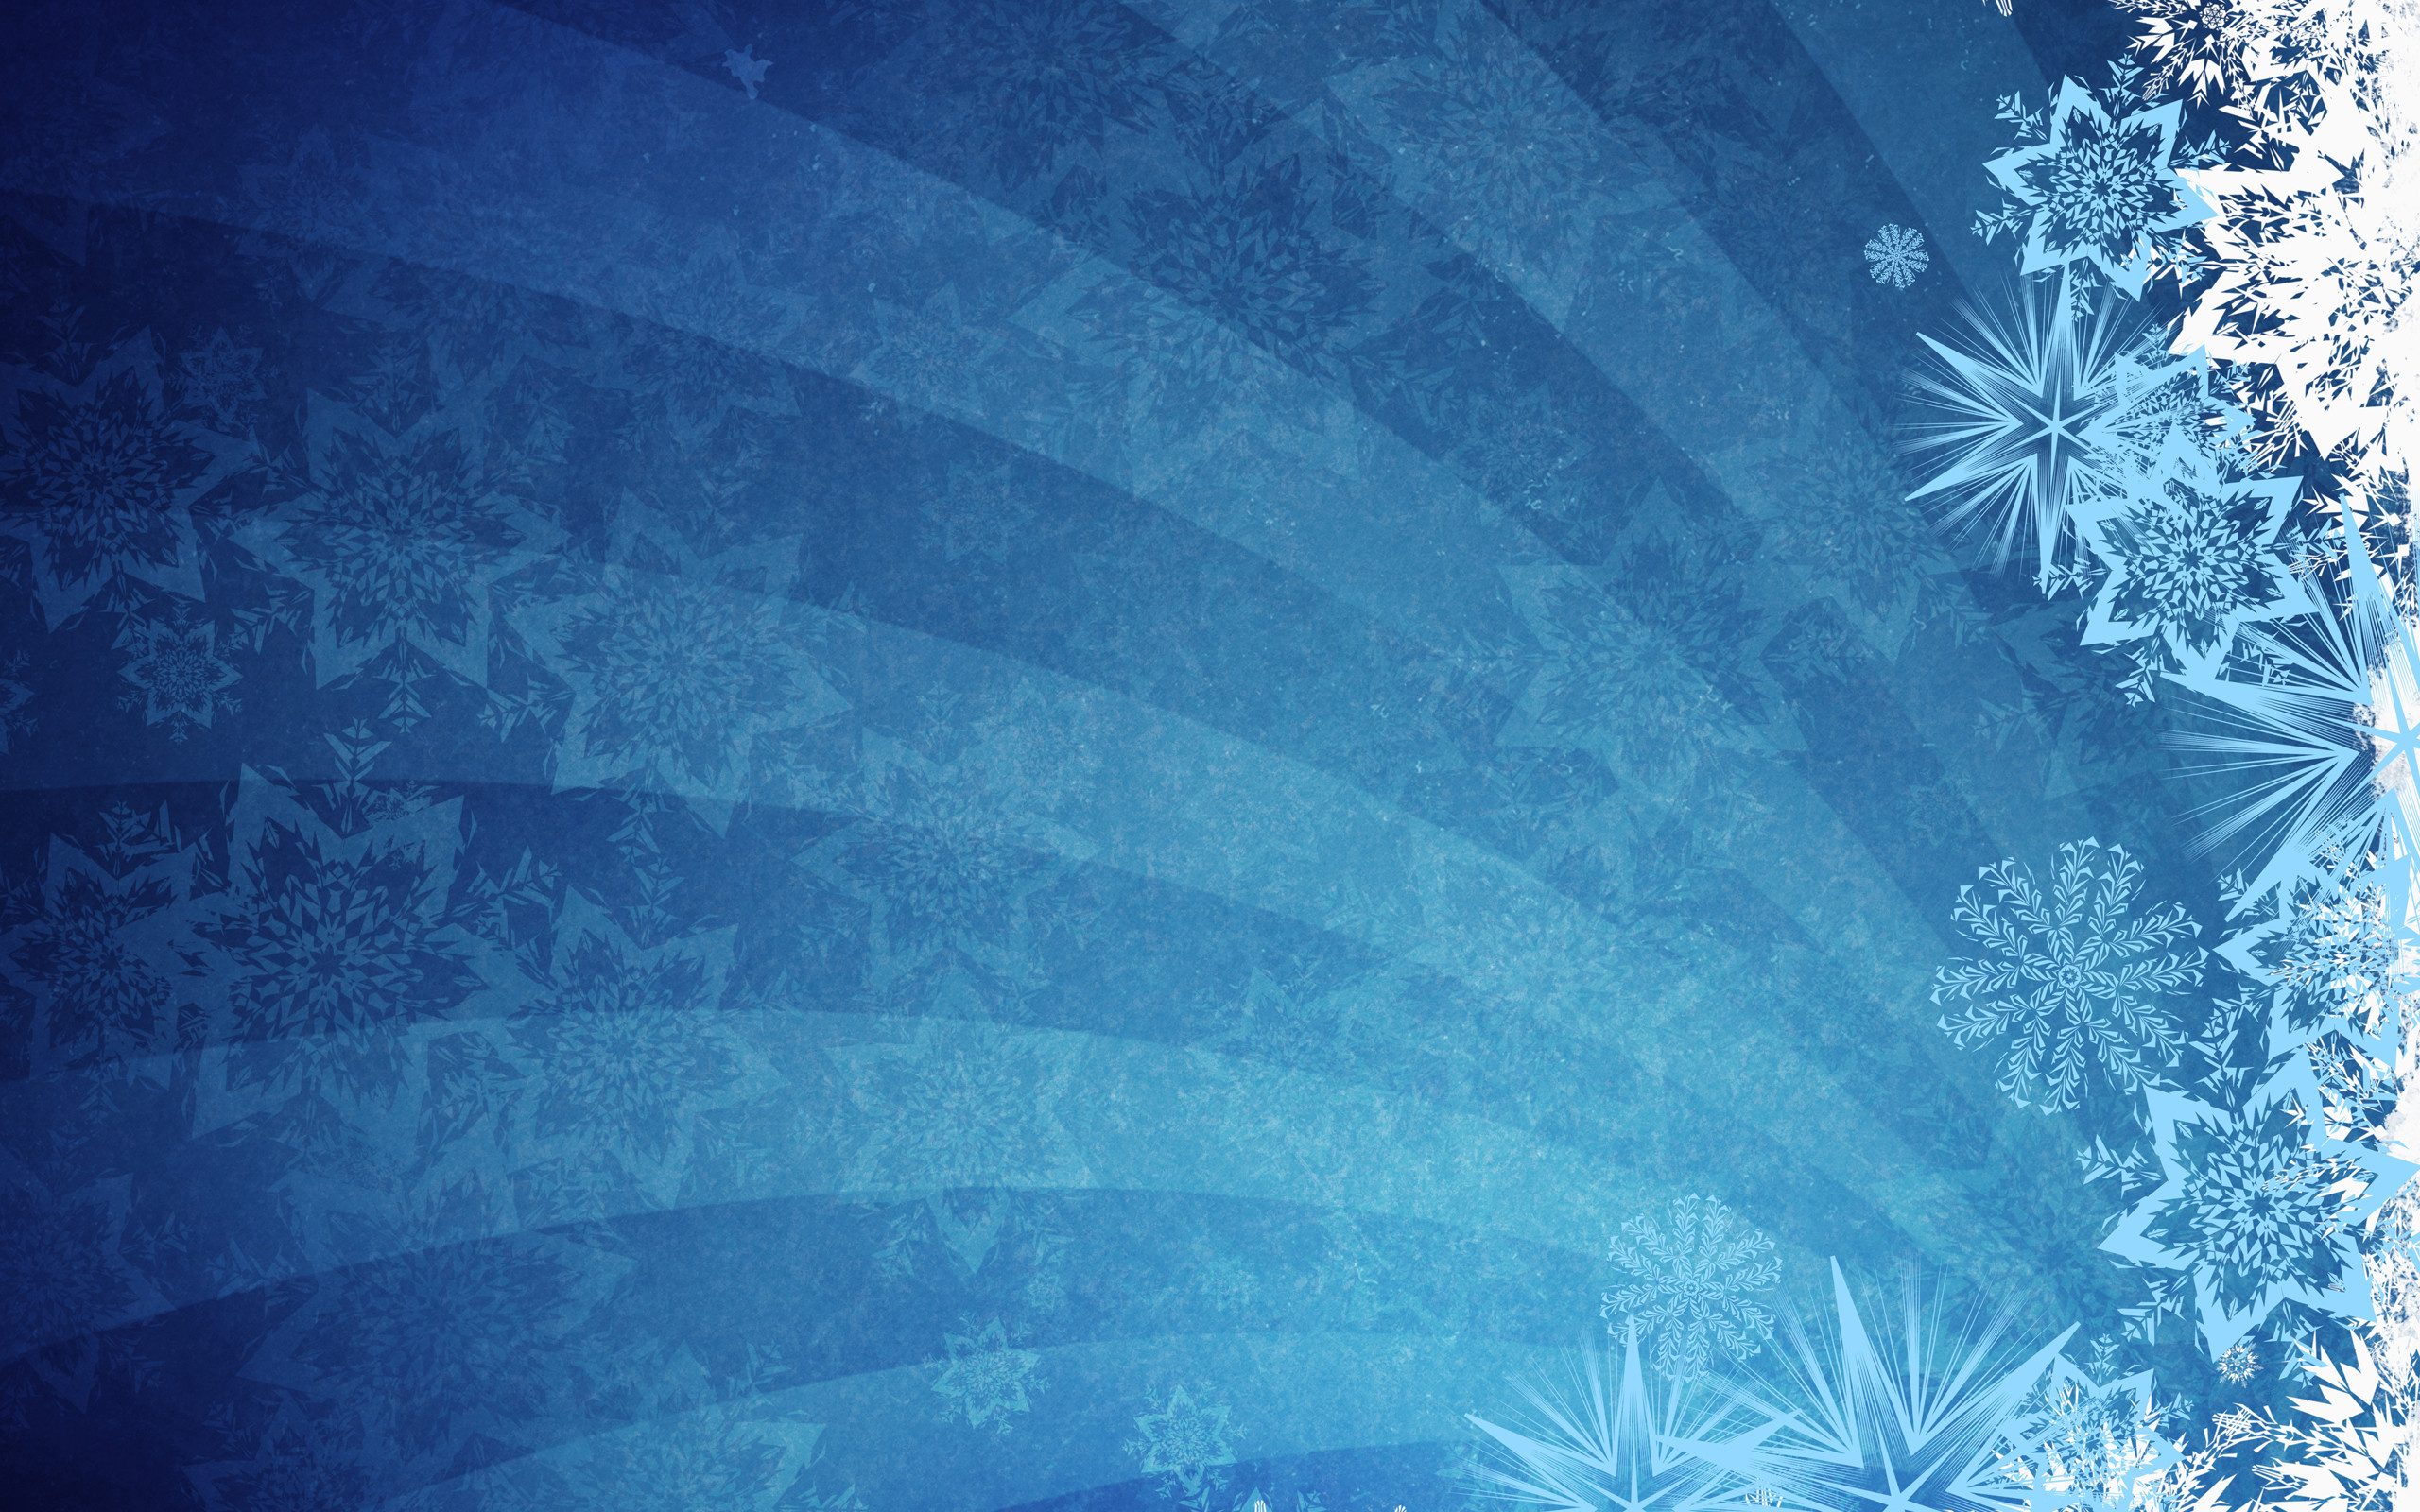 Blue Grunge Grunge Background Snowflakes Vectors #10192